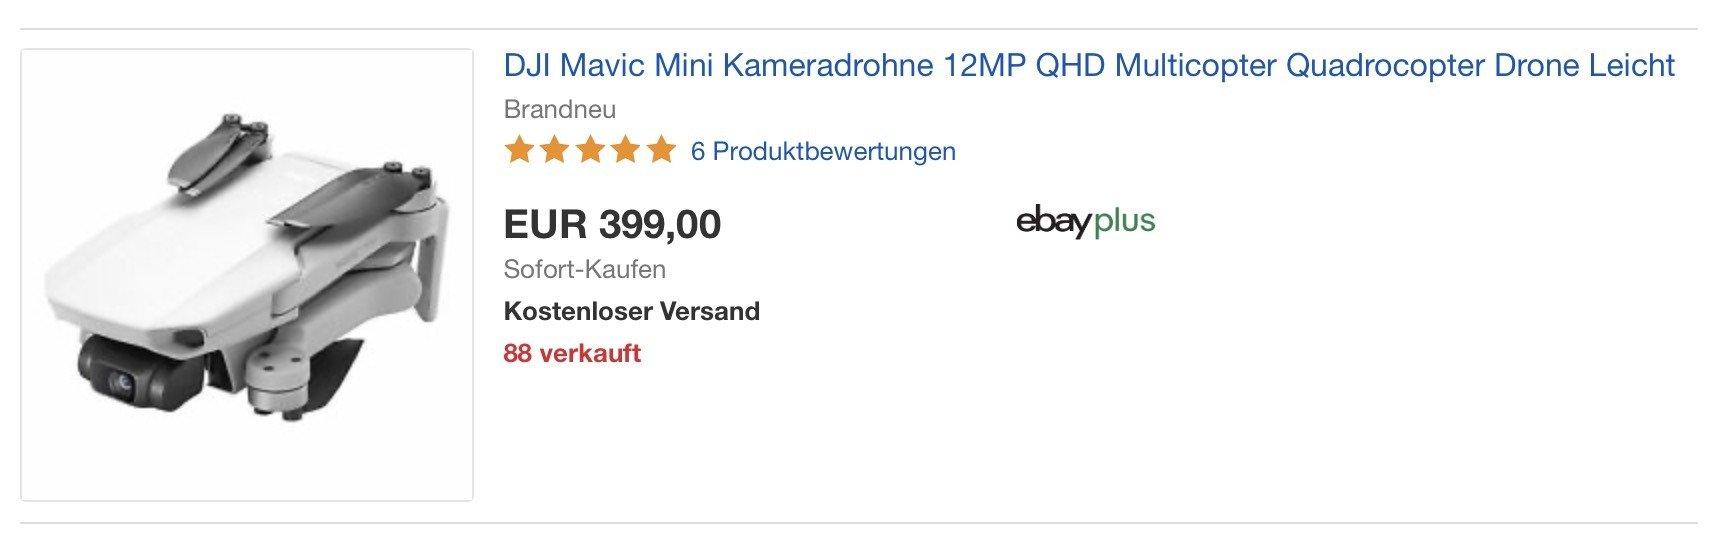 DJI Mavic Mini Angebot Deutschland